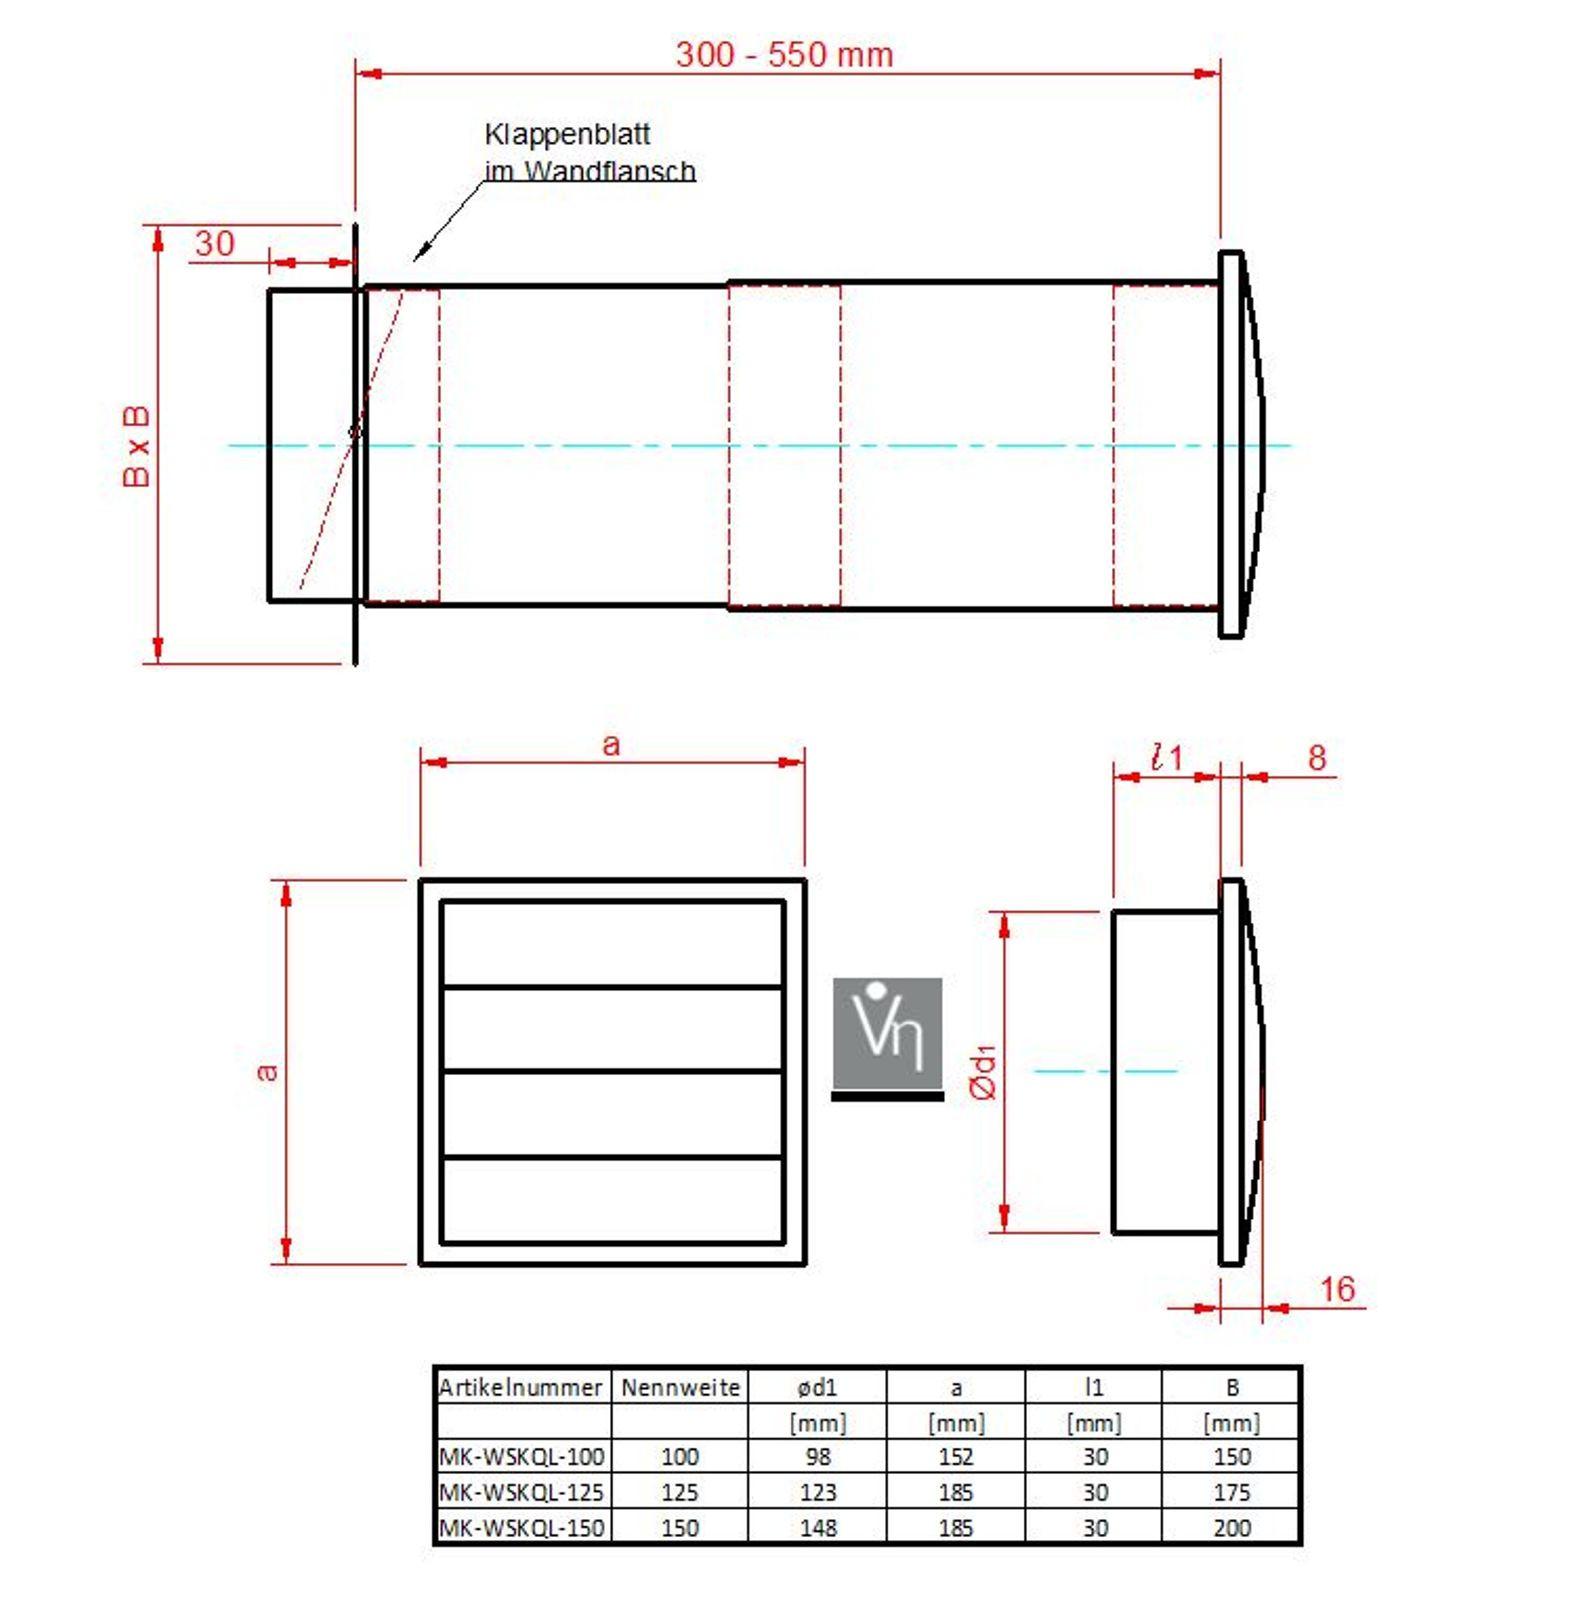 dunstabzugshaube mauerkasten swalif. Black Bedroom Furniture Sets. Home Design Ideas